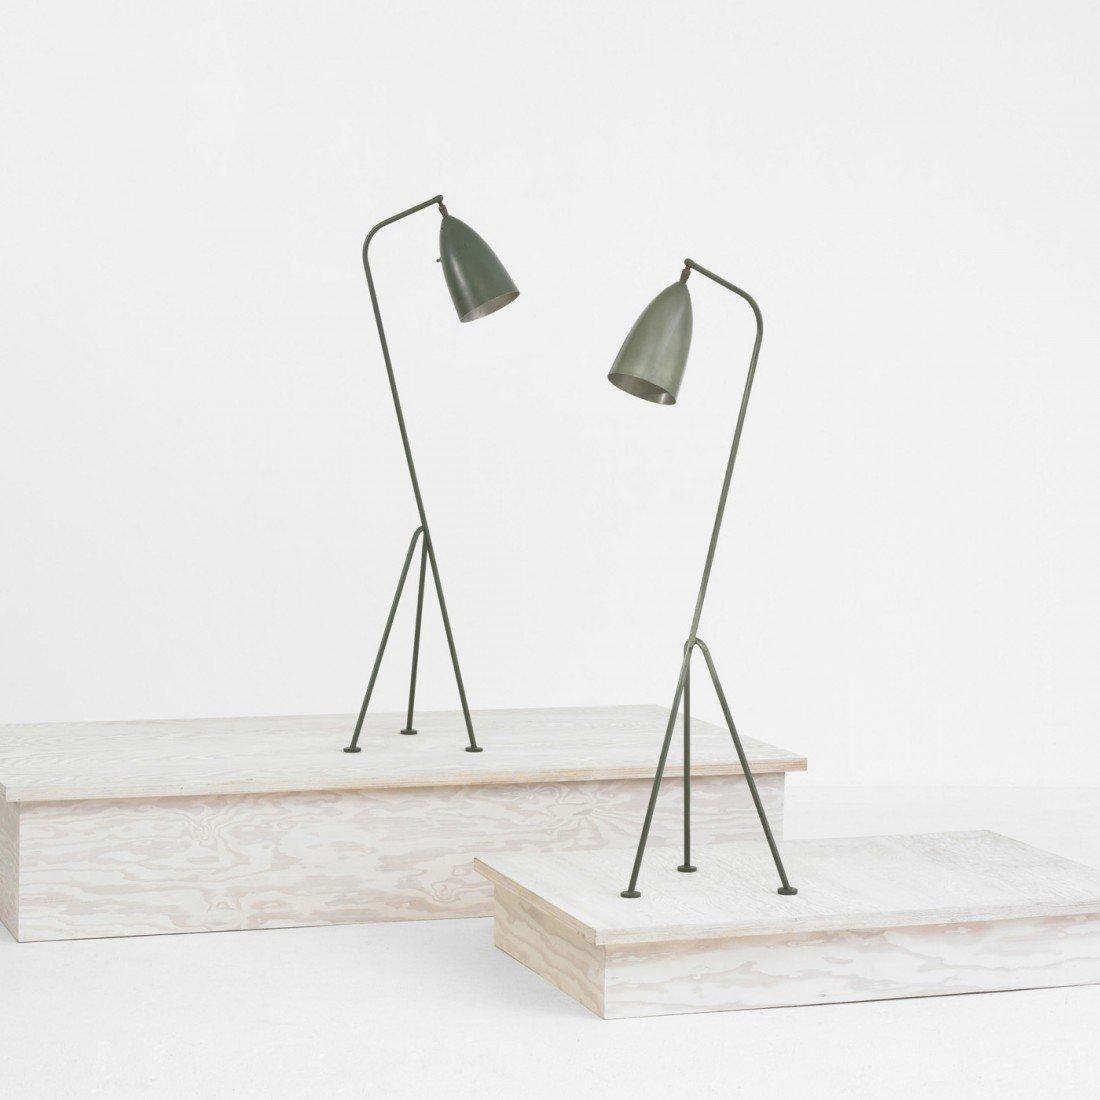 104: Grossman Grasshopper floor lamps, pair